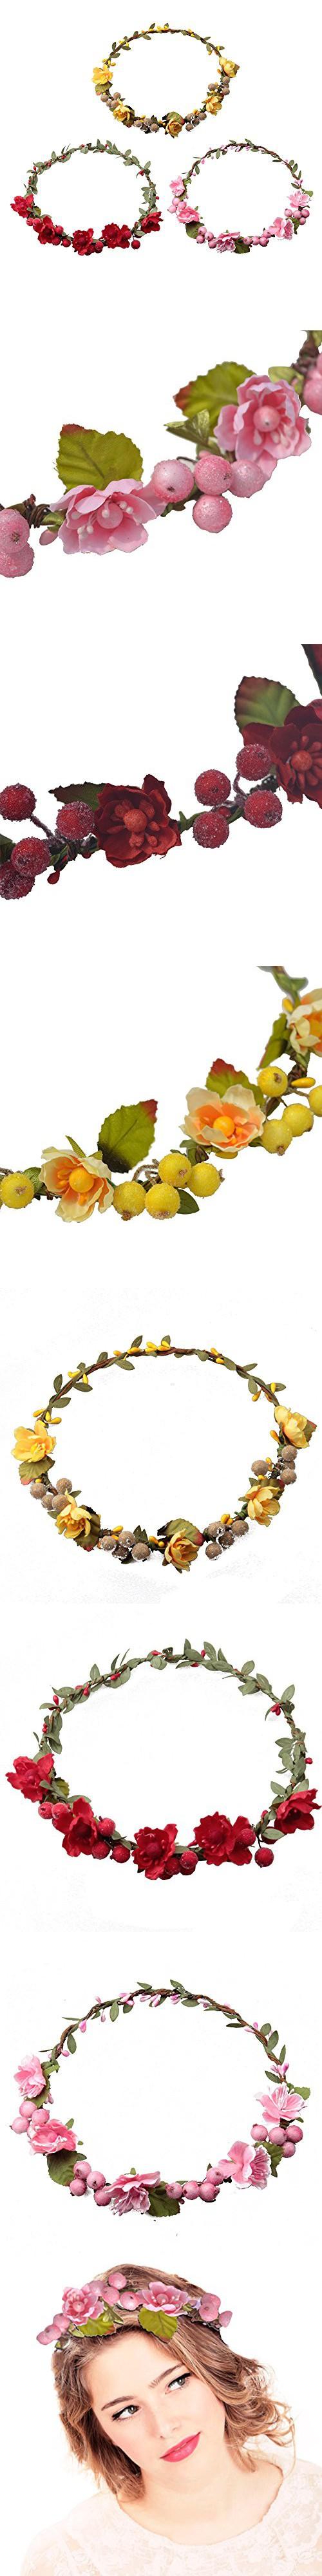 Dreshow 3 pack flower crown for women berries wreath boho headband dreshow 3 pack flower crown for women berries wreath boho headband festivals wedding red pink yellow izmirmasajfo